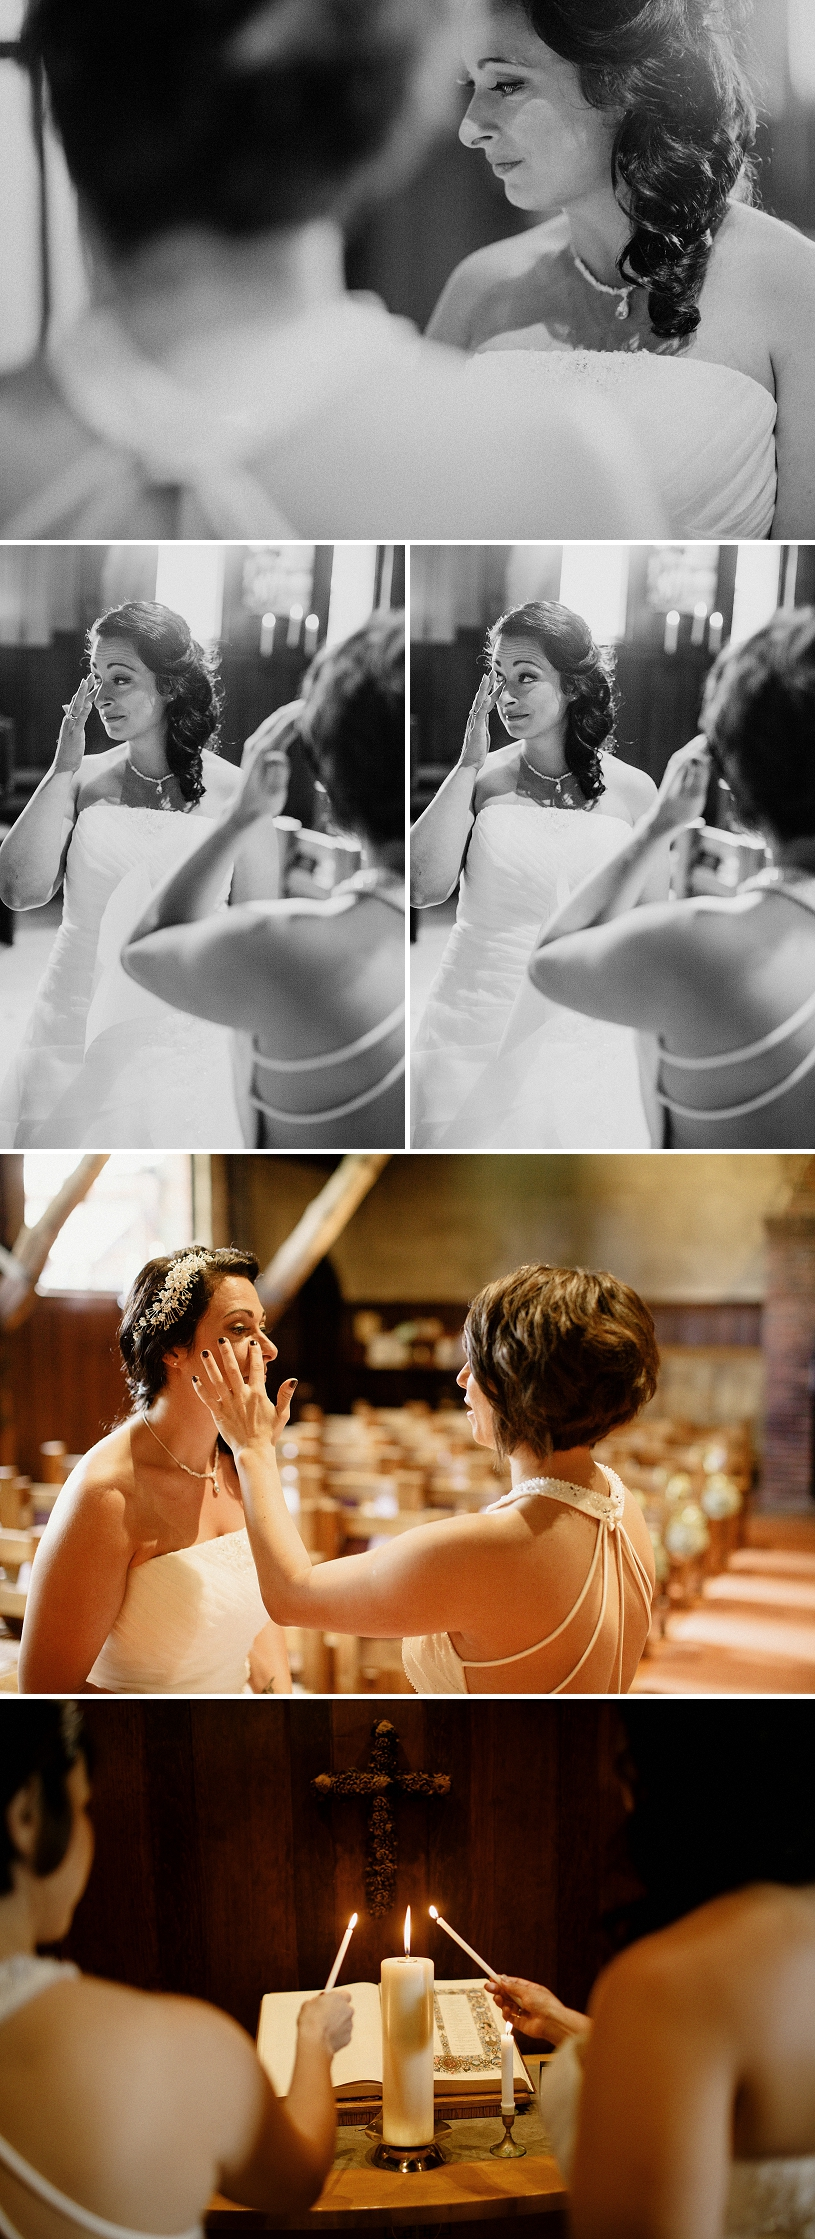 Emotional Lesbian wedding ceremony